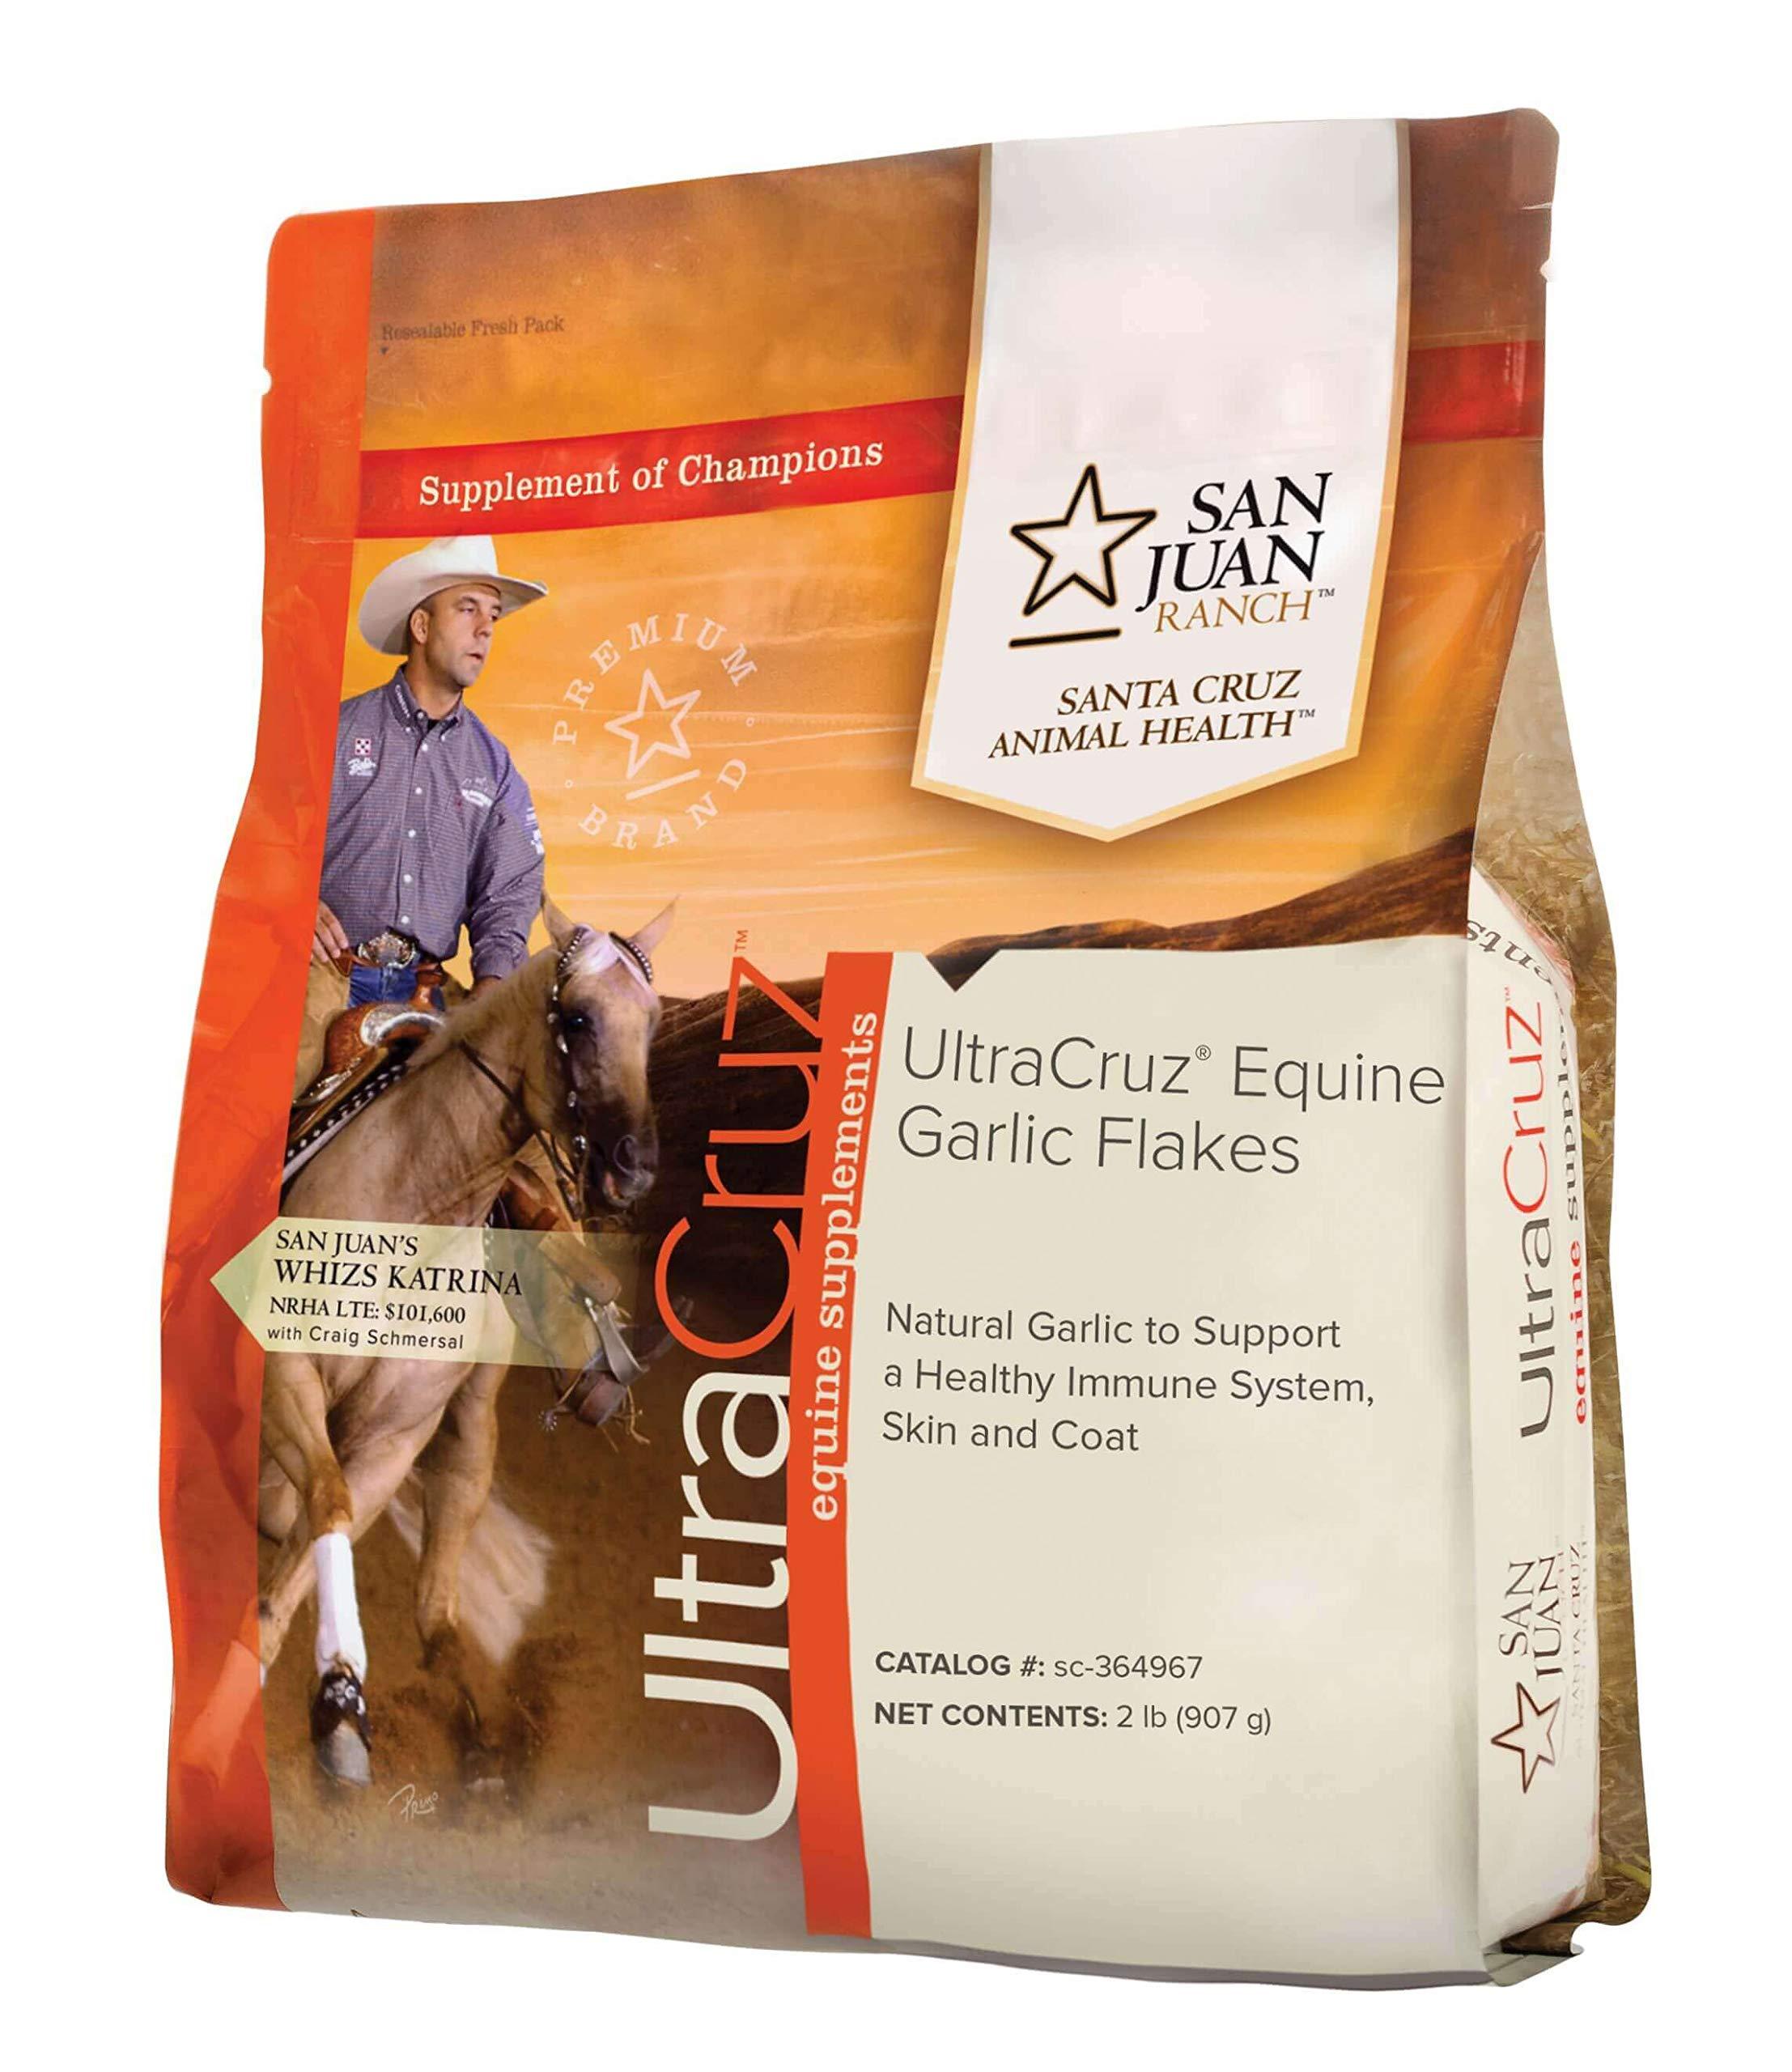 UltraCruz Equine Garlic Flakes Supplement for Horses, 2 lb (90 Day Supply) by UltraCruz